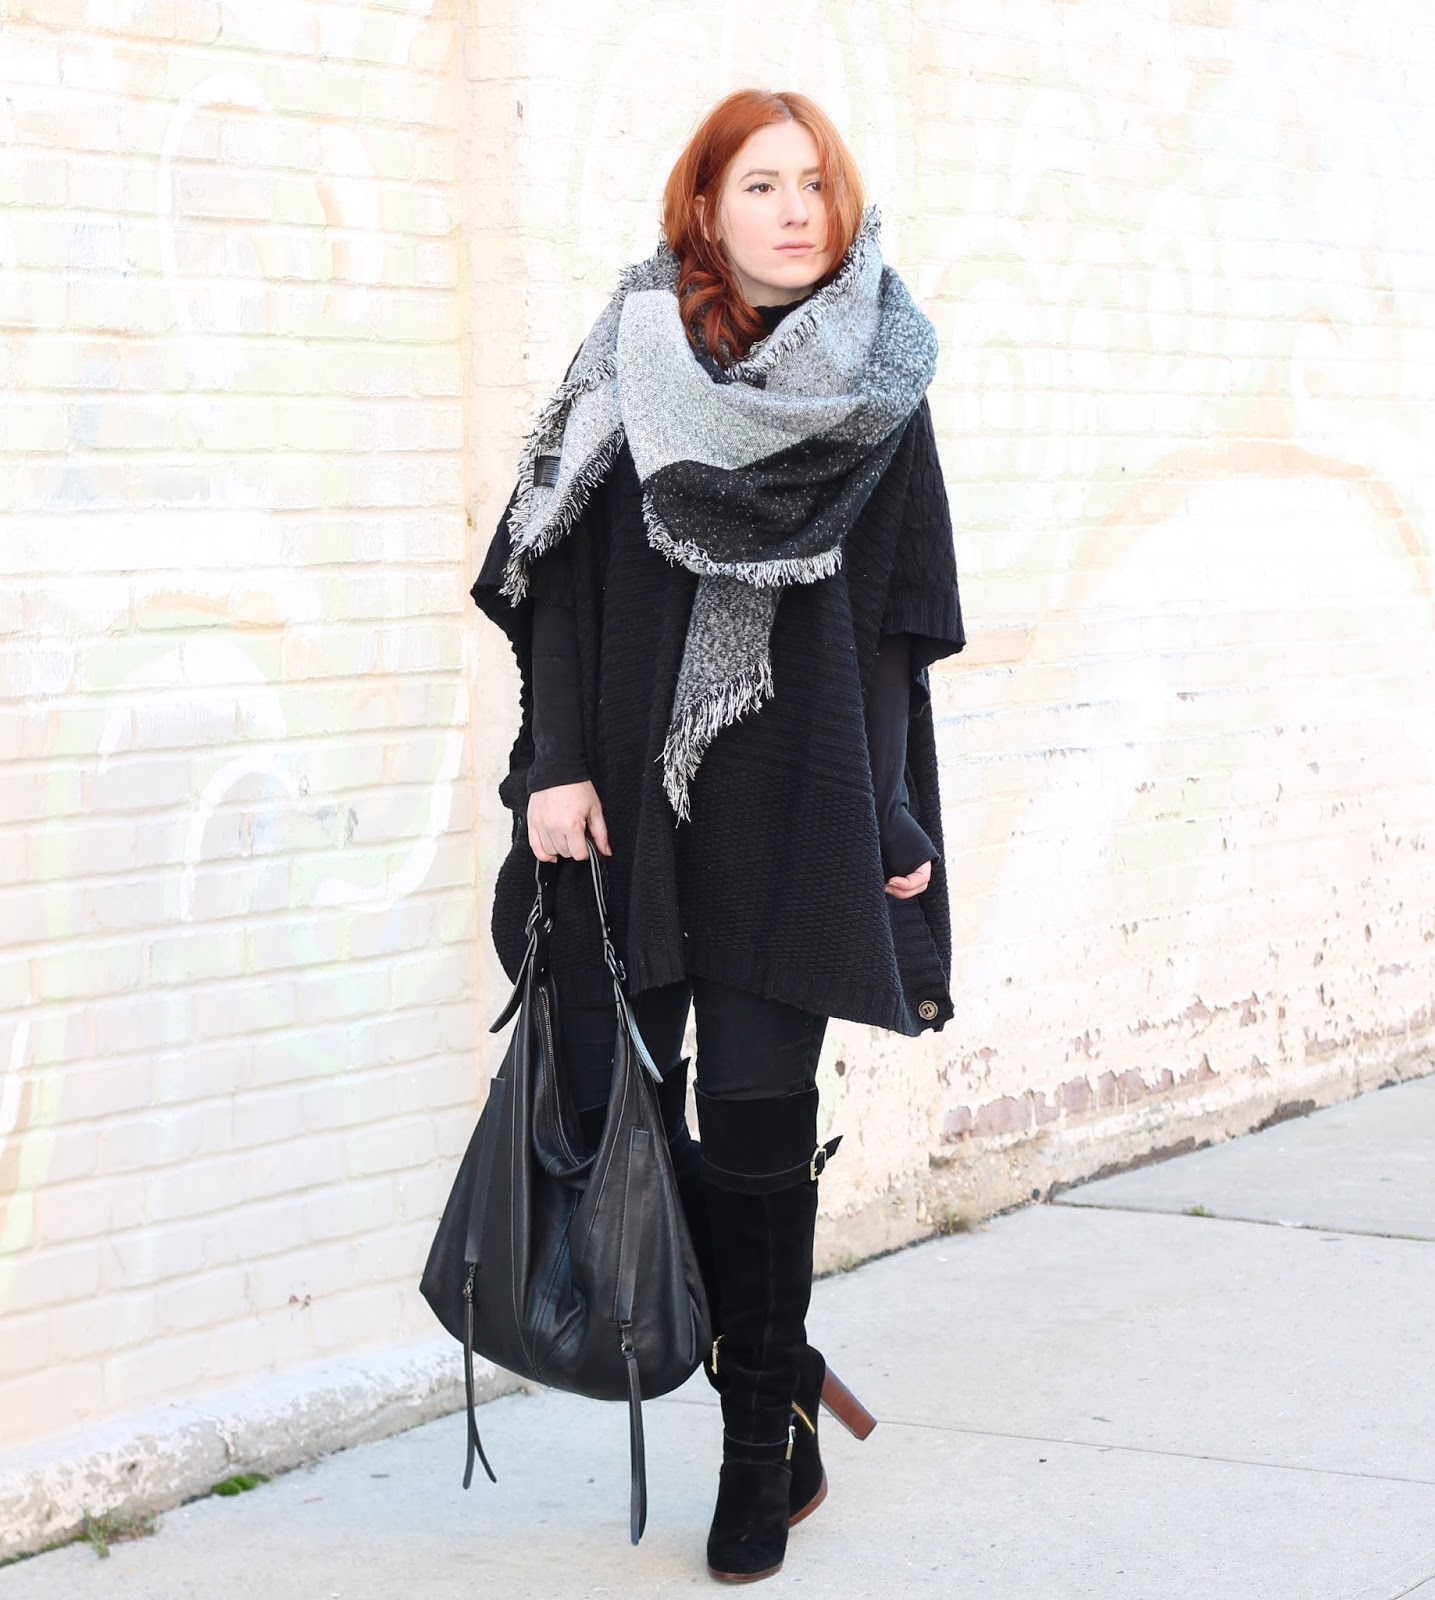 blanket scarf, black on black, winter layering, fashion style, winter, blanket scarf style, how to wear a blanket scarf, kooba bags, how to wear a poncho, poncho style